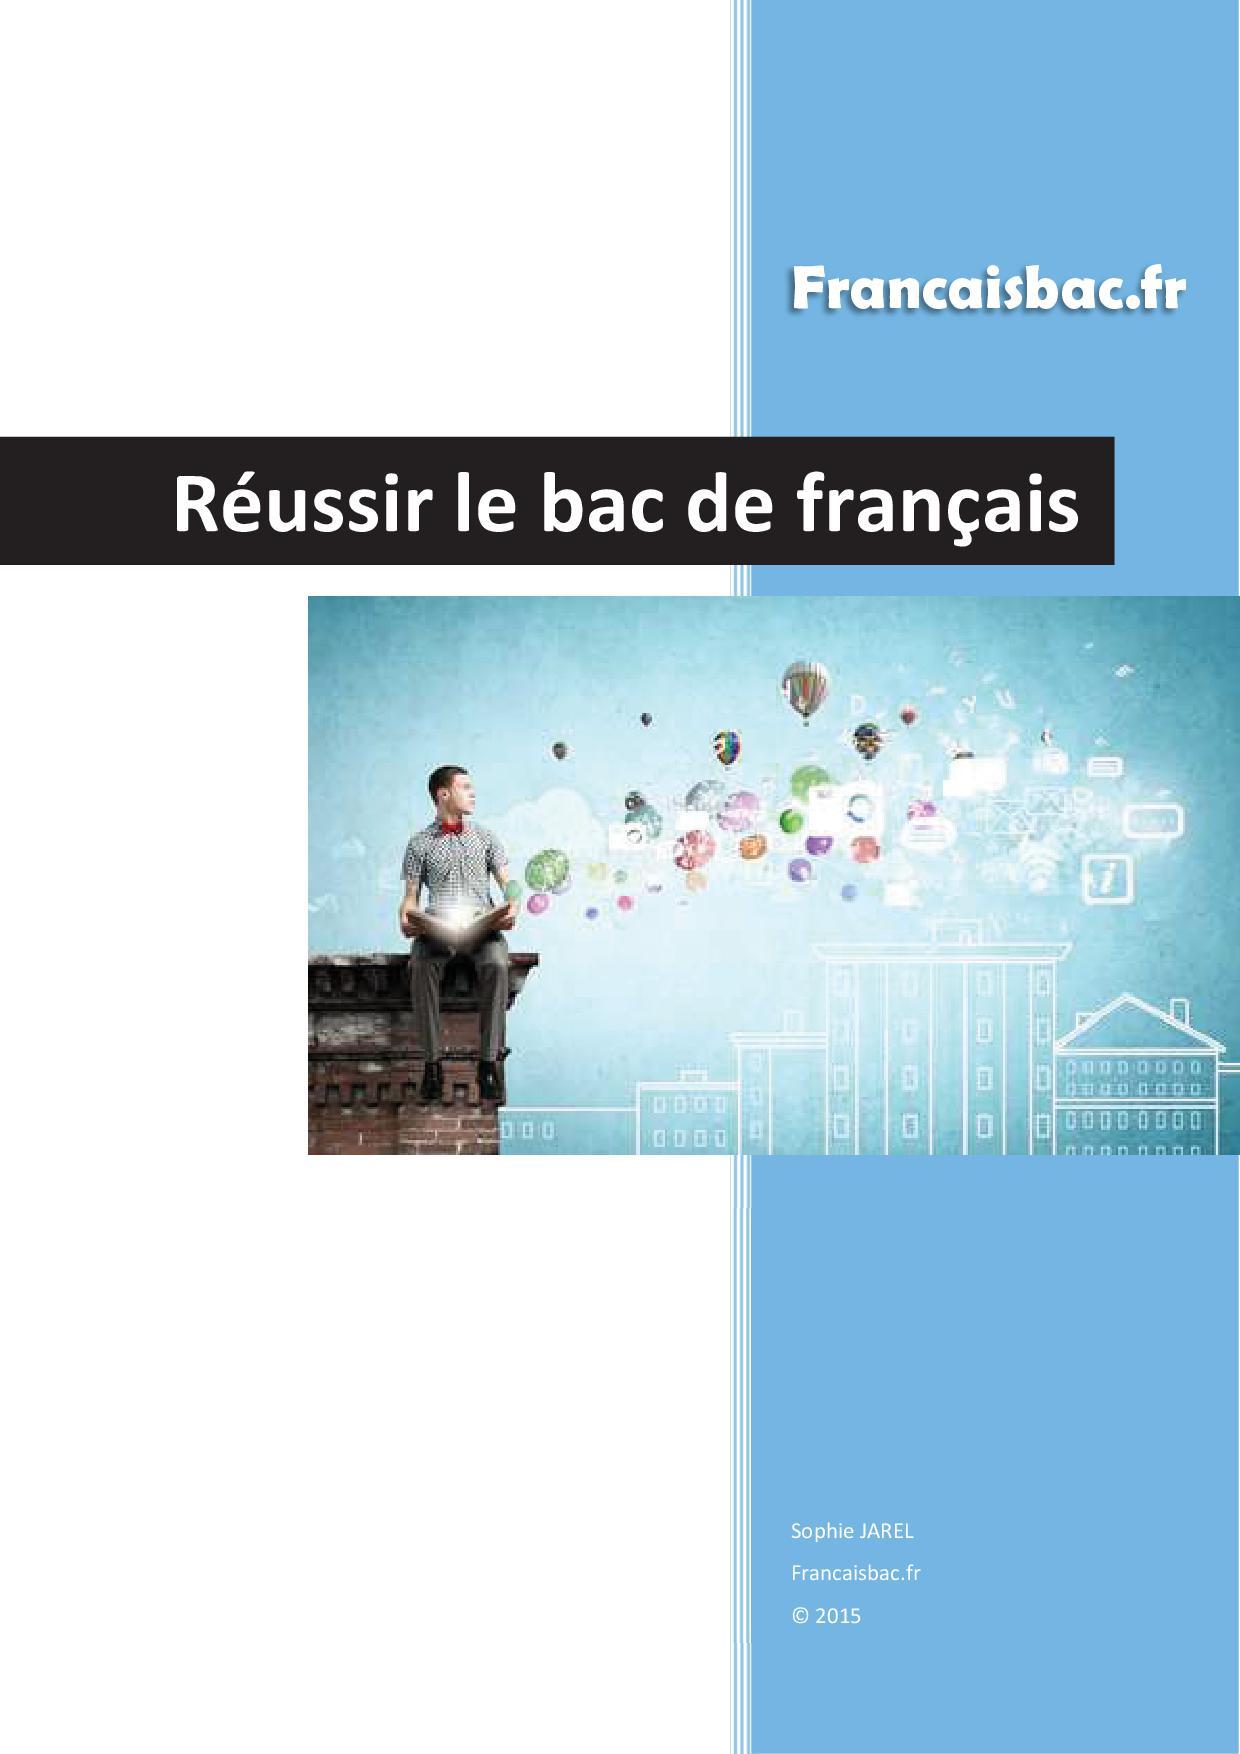 Page De Garde Francaisbac Fr